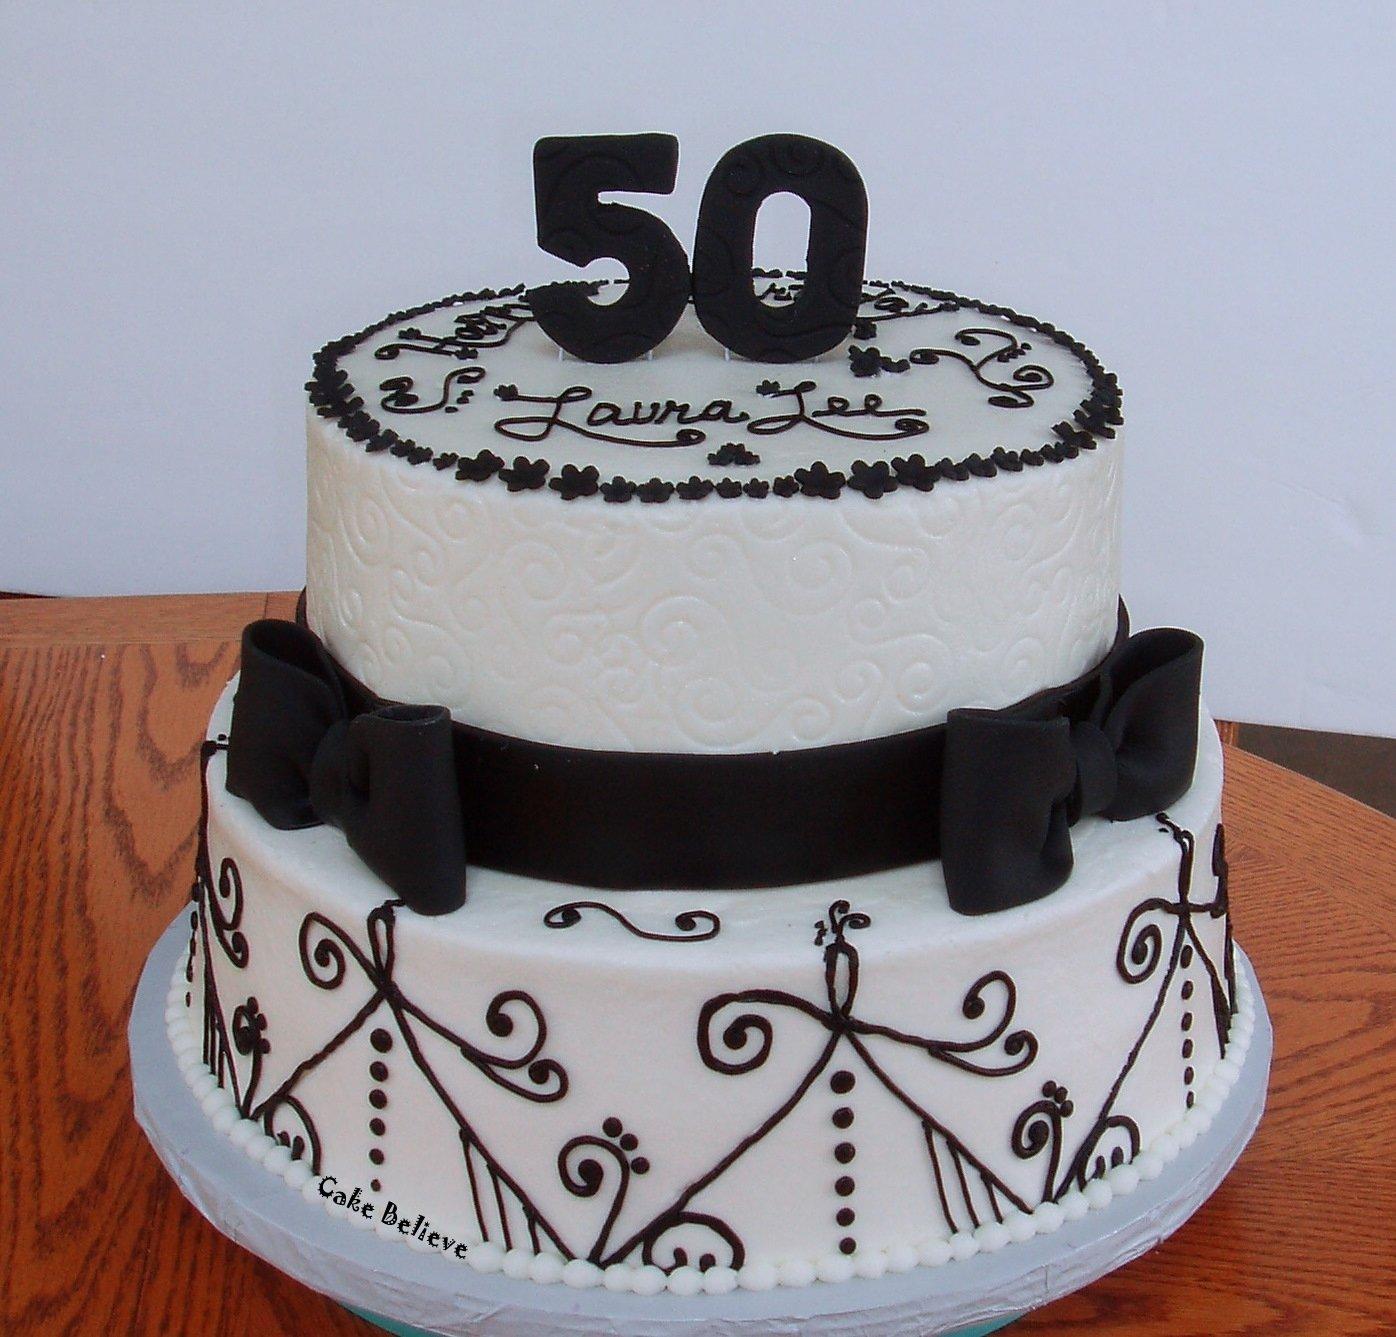 10 Pretty 50th Birthday Cake Ideas For Men